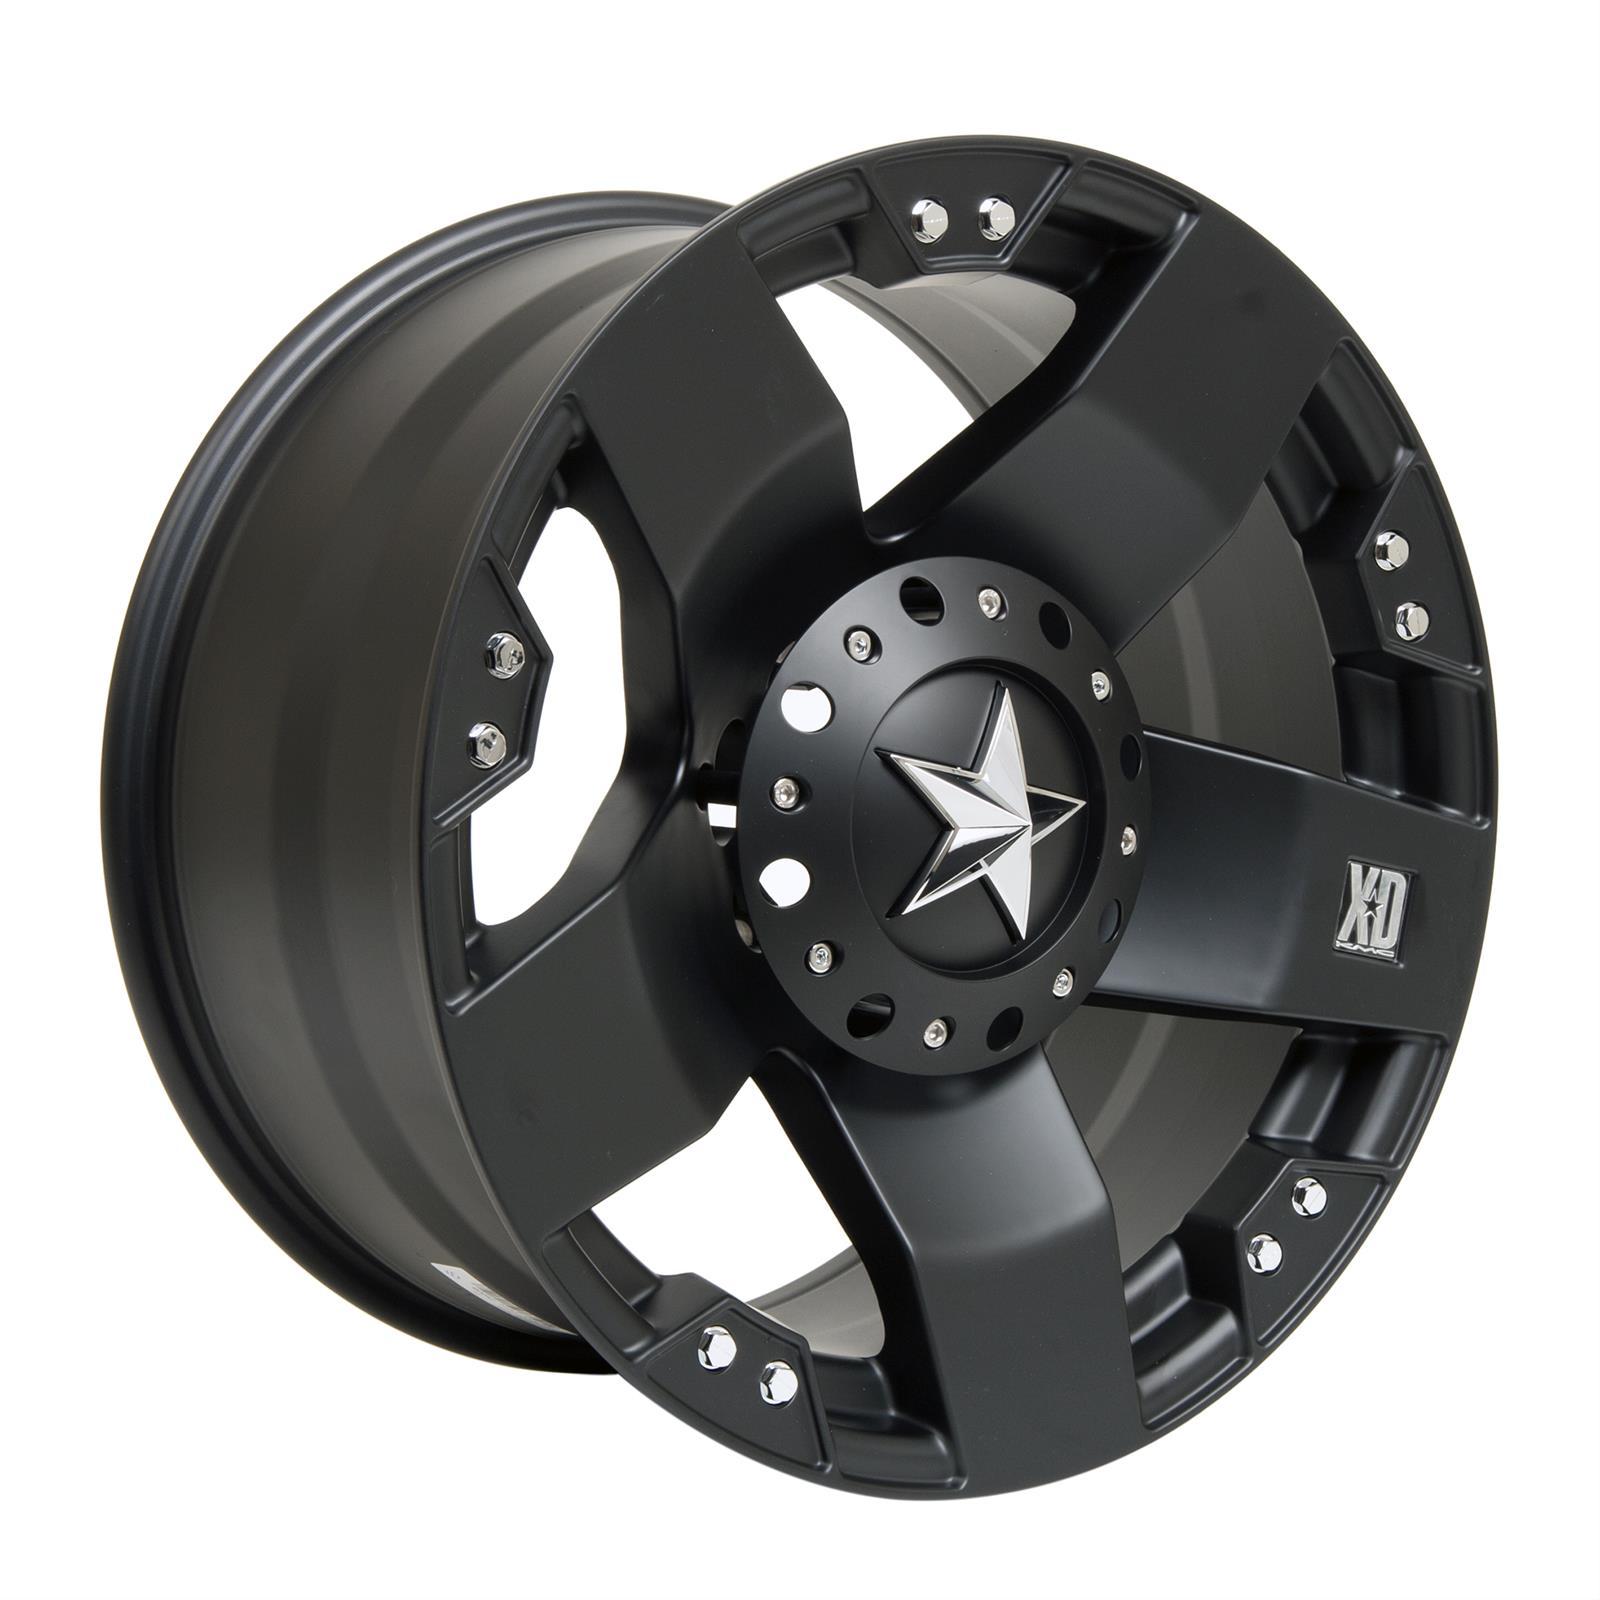 20x10 KMC XD775 Rockstar 6x5.5 6x135-24 OFFSET XD77521067324 Wheels Rims